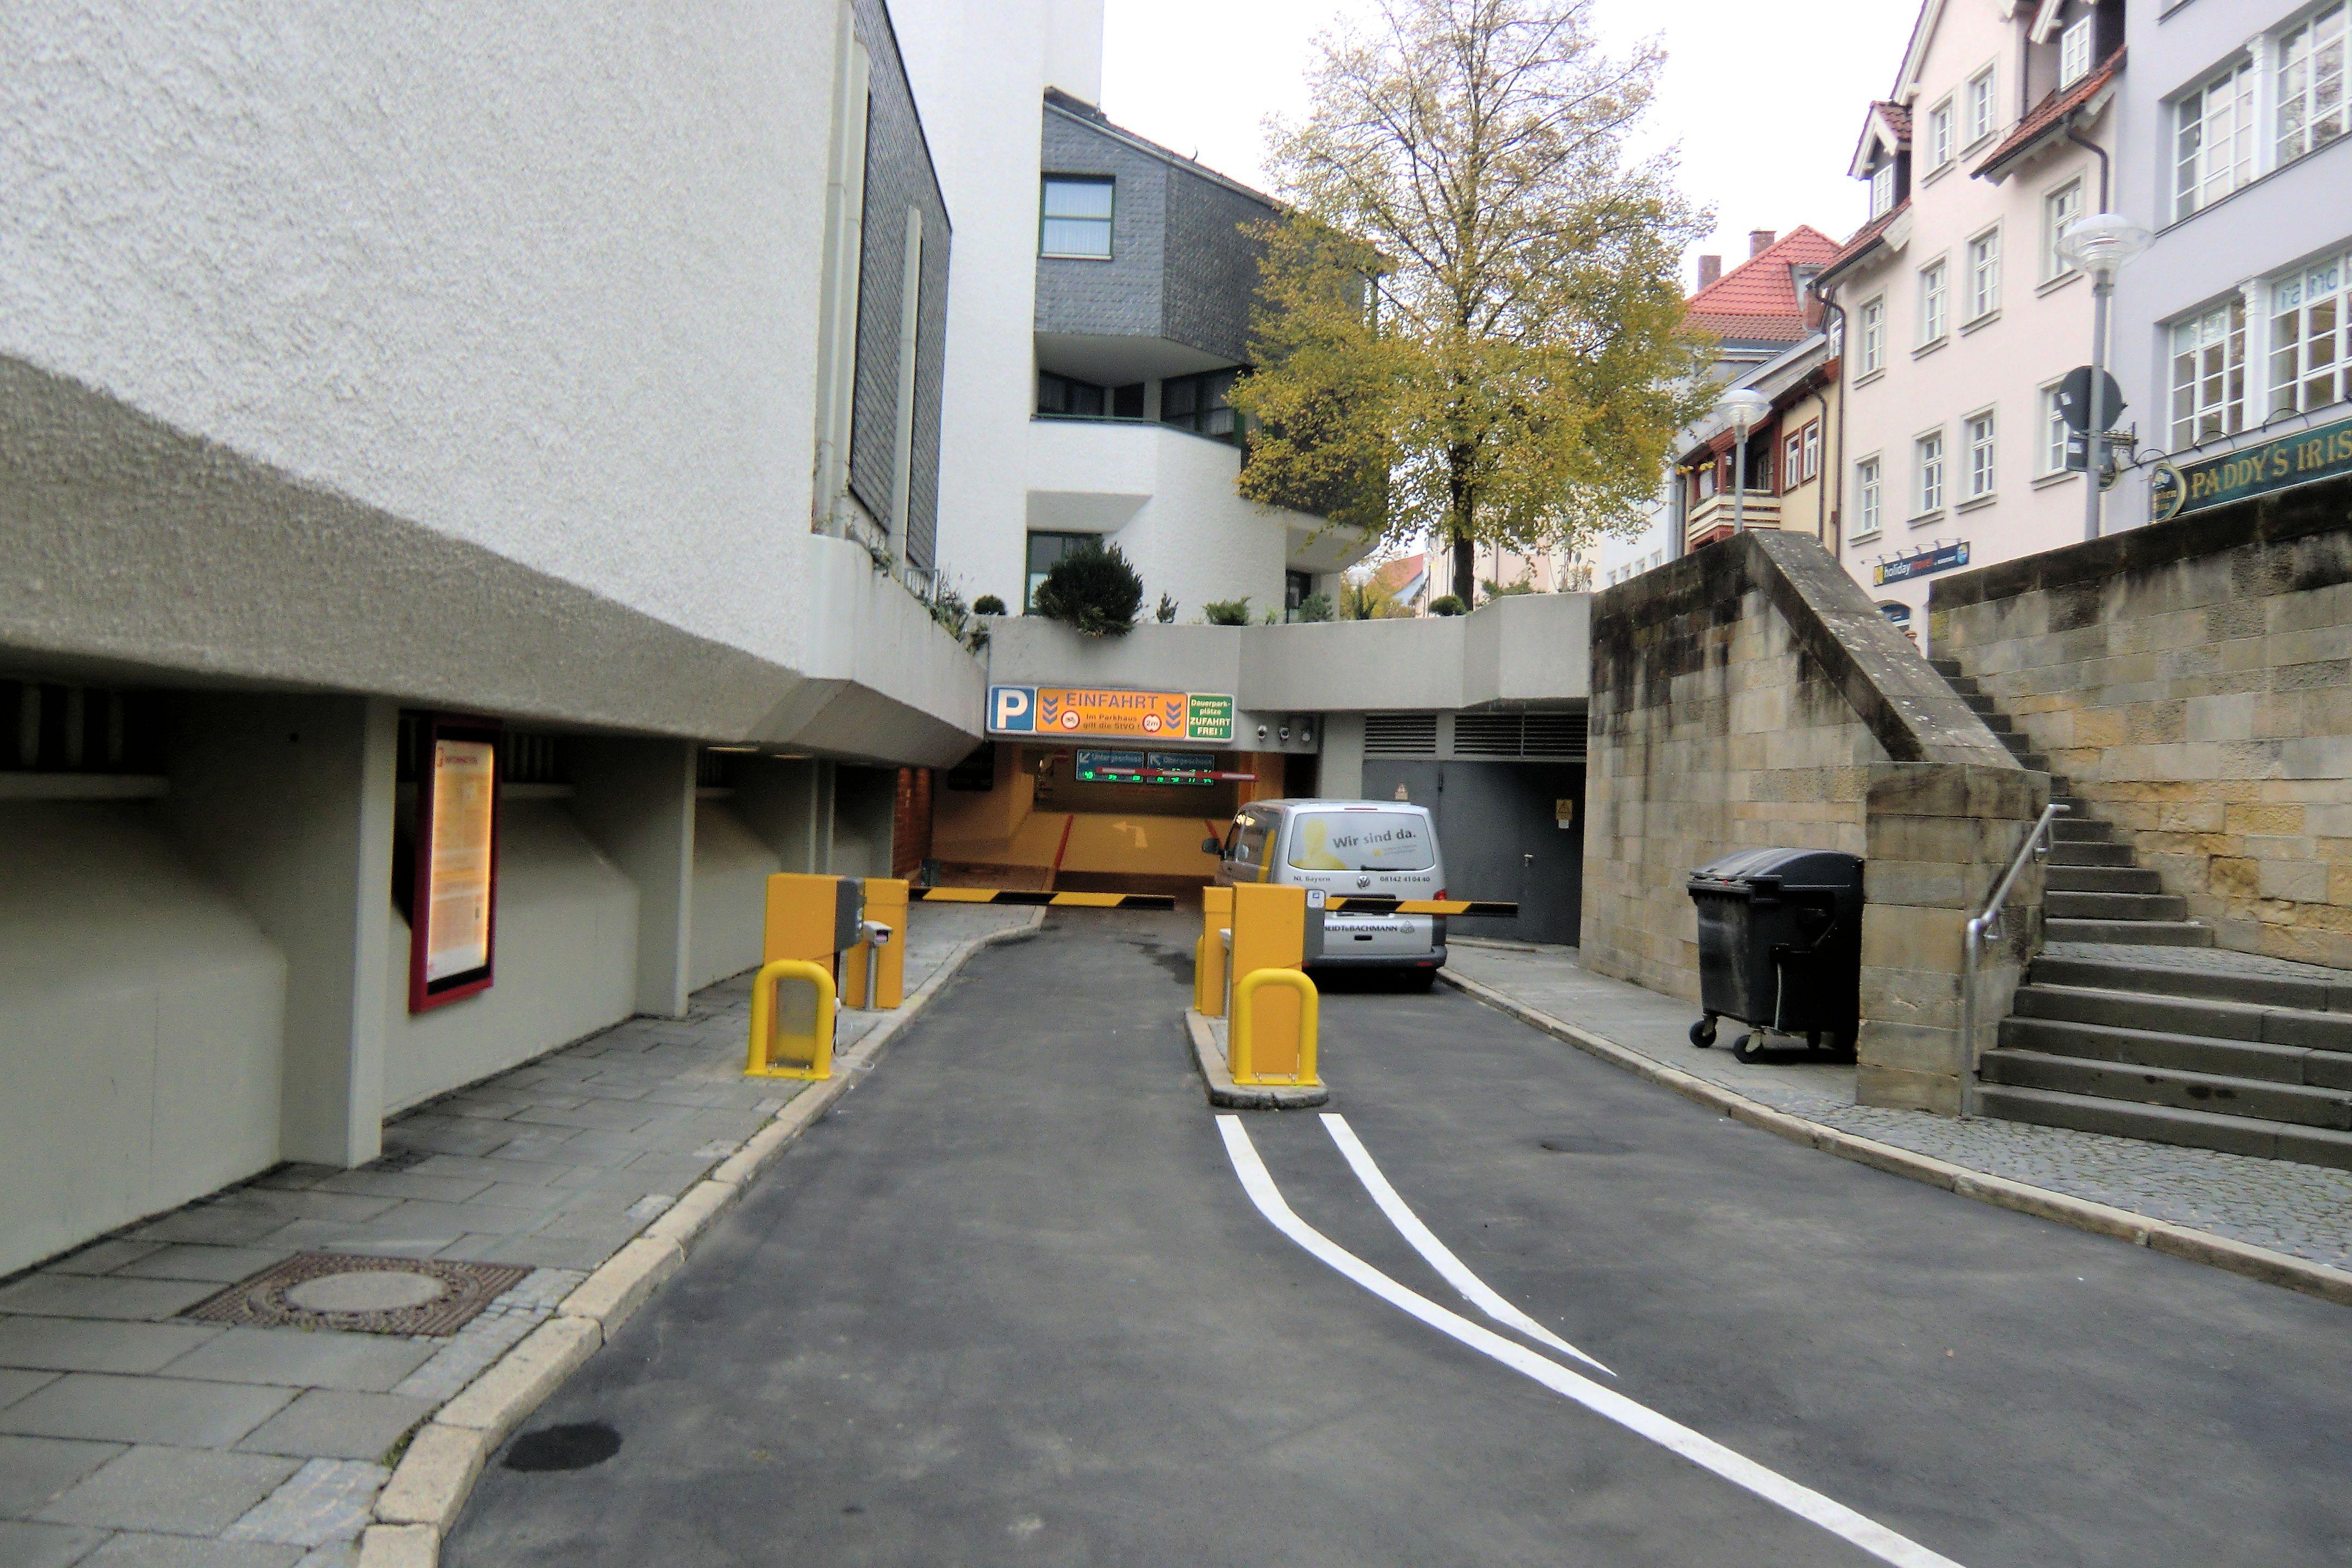 Einfahrt Parkhaus Mauer